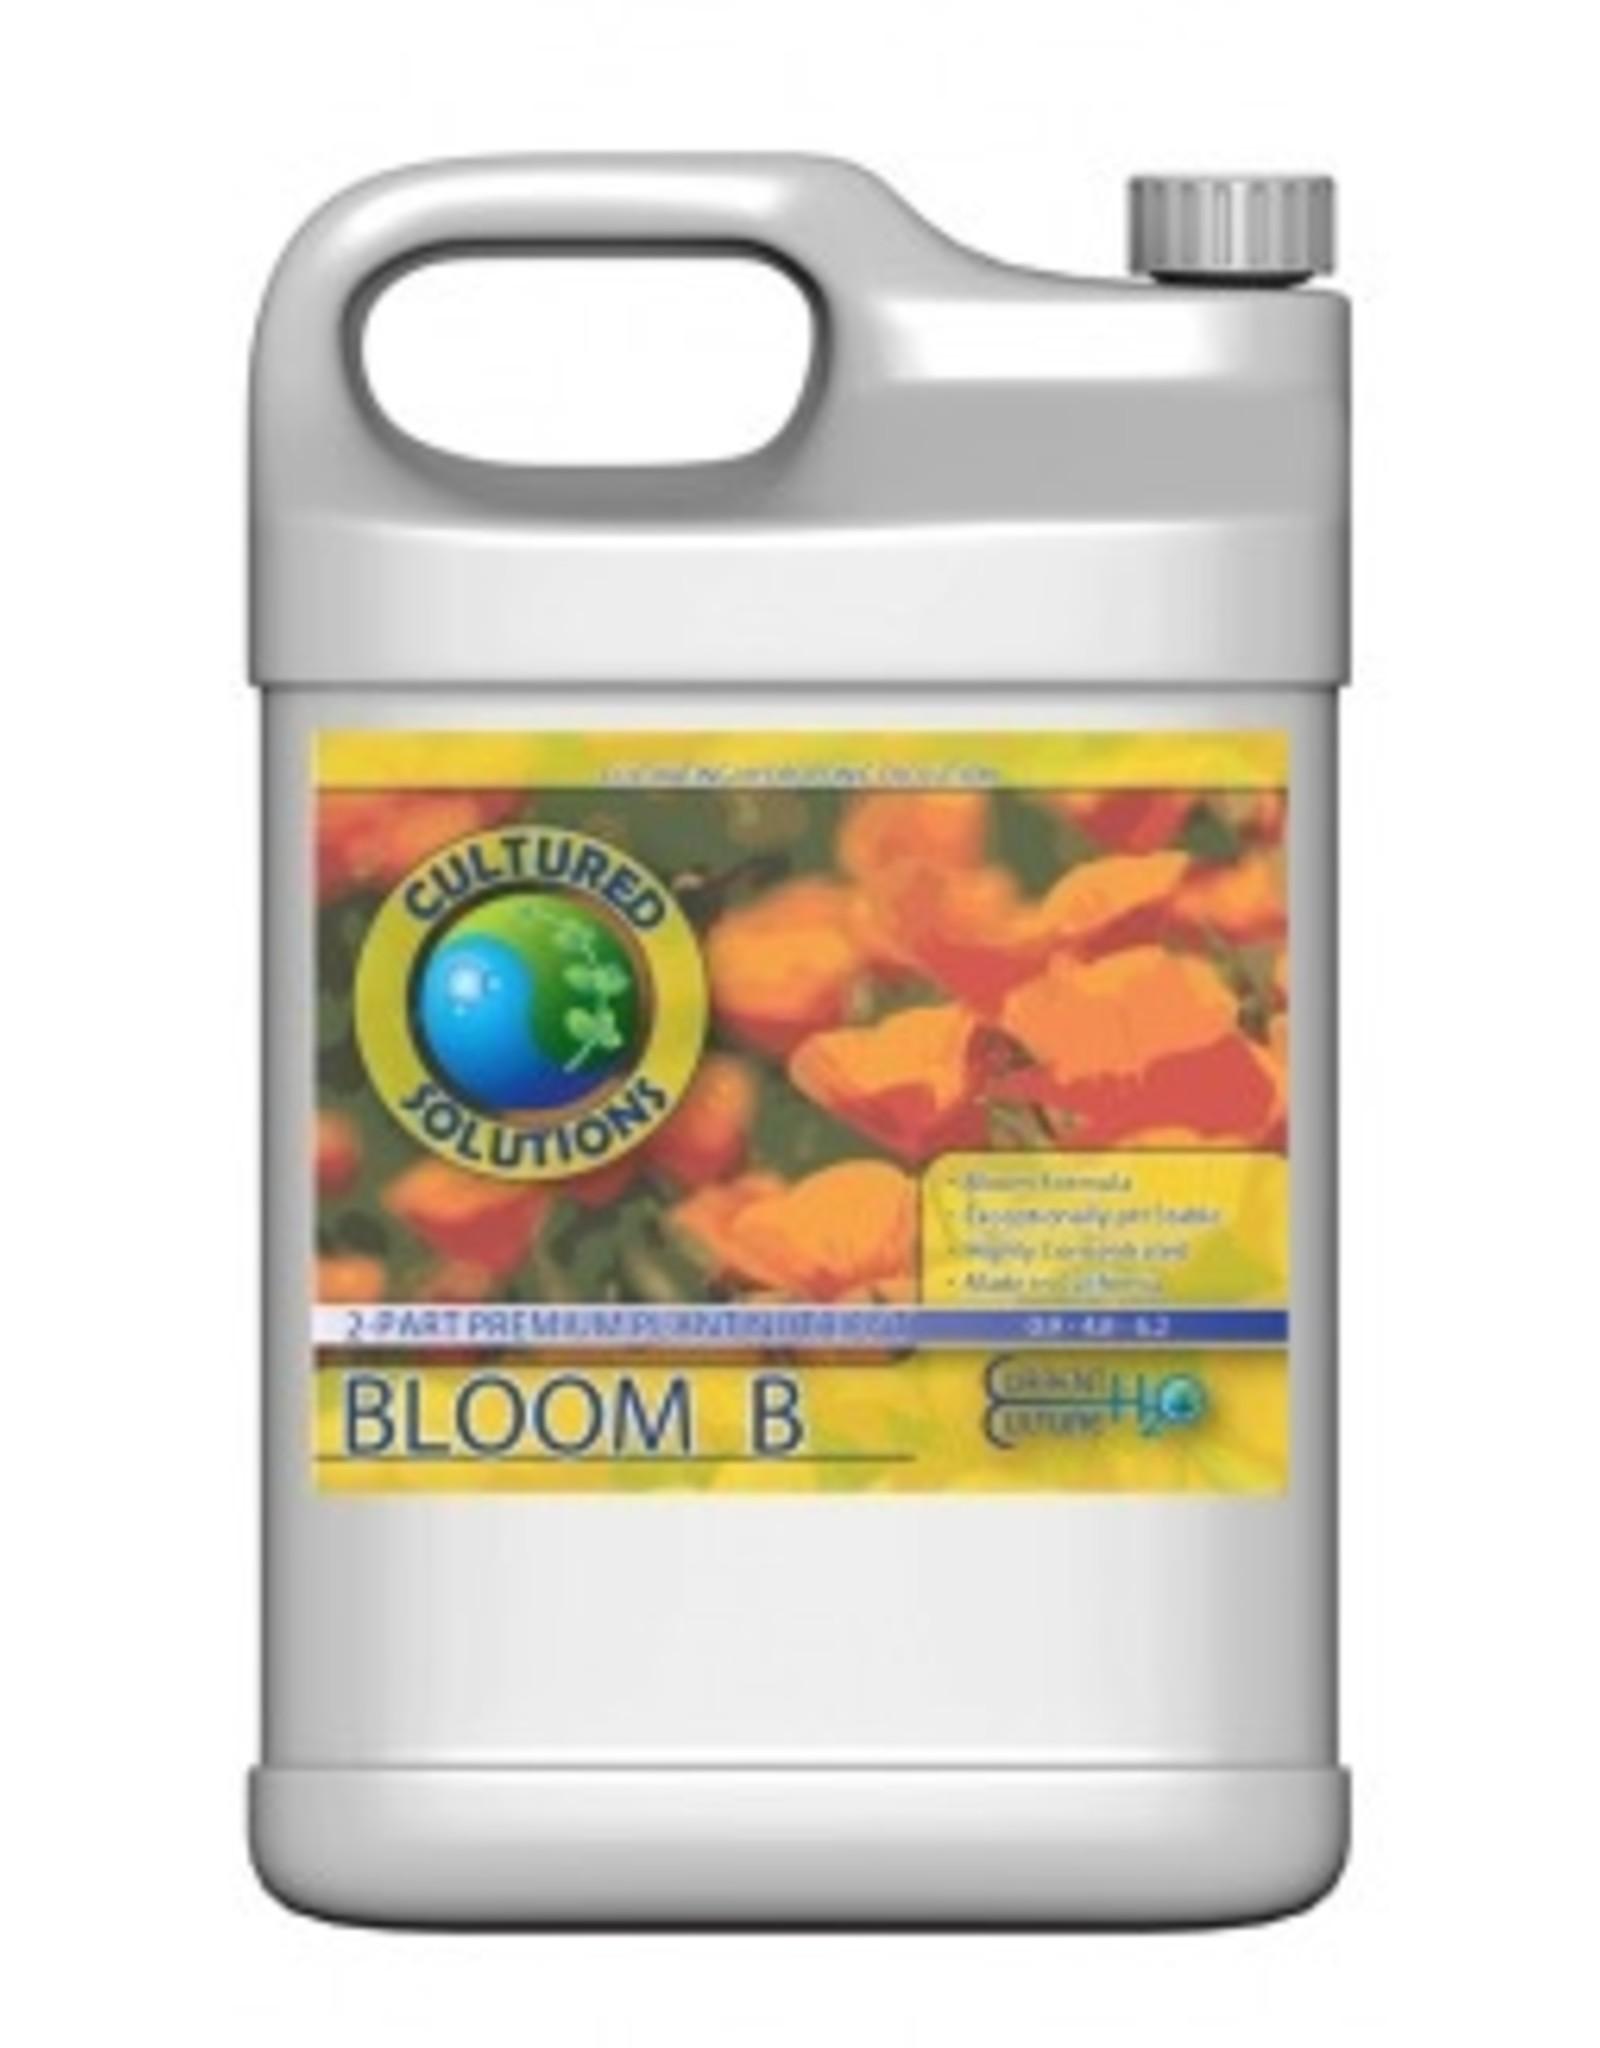 Current Culture H2O CULTURED SOLUTIONS BLOOM B GAL